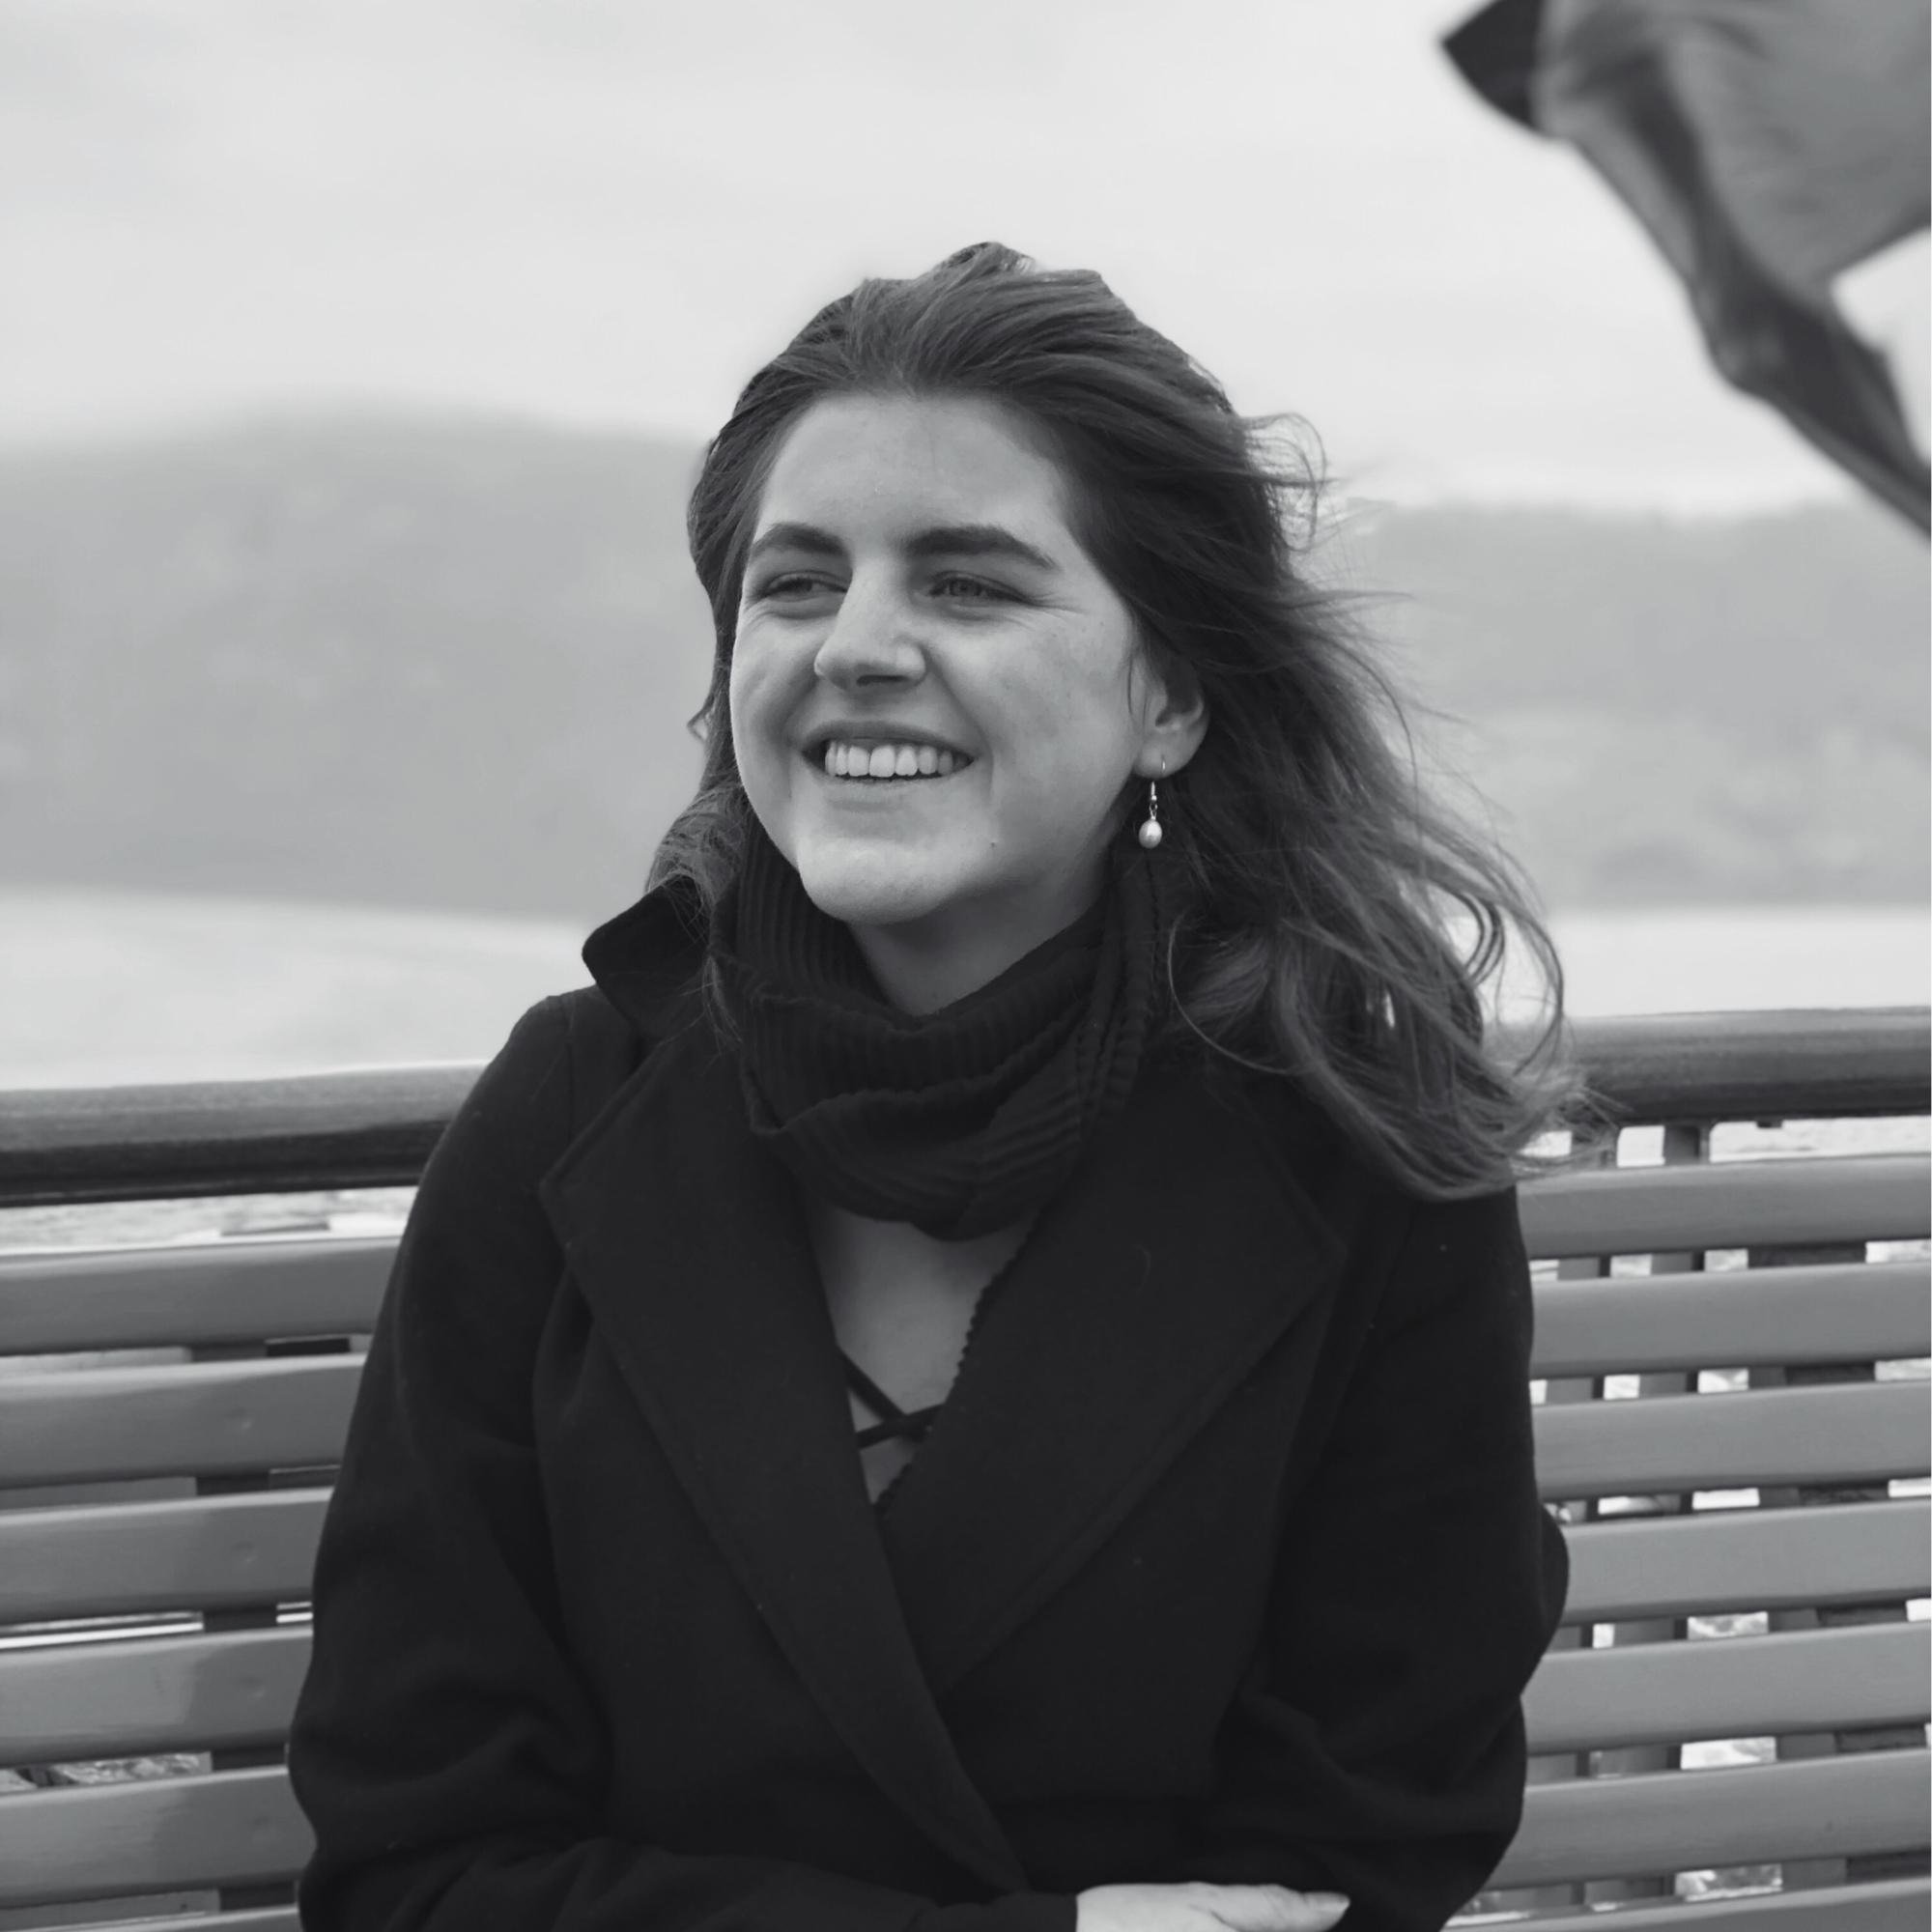 Image of Anna